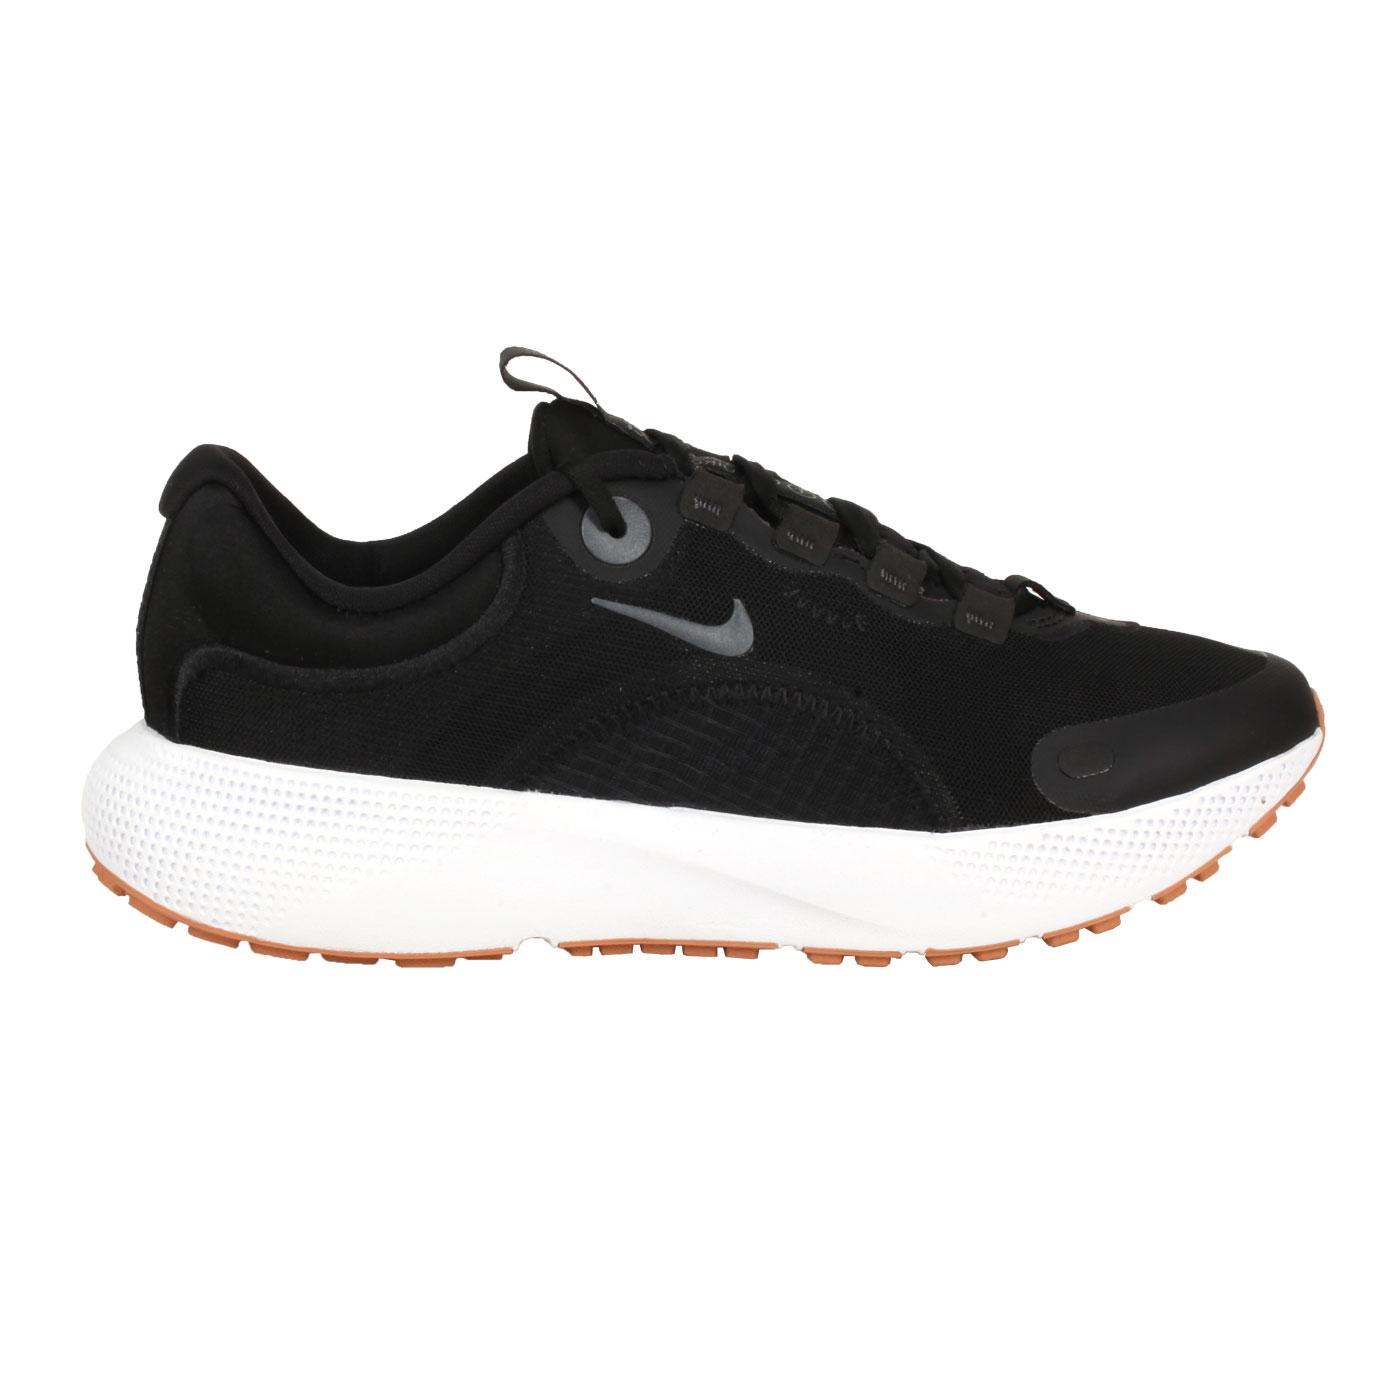 NIKE 女款運動休閒鞋  @WMNS REACT ESCAPE RN@CV3817002 - 黑銀